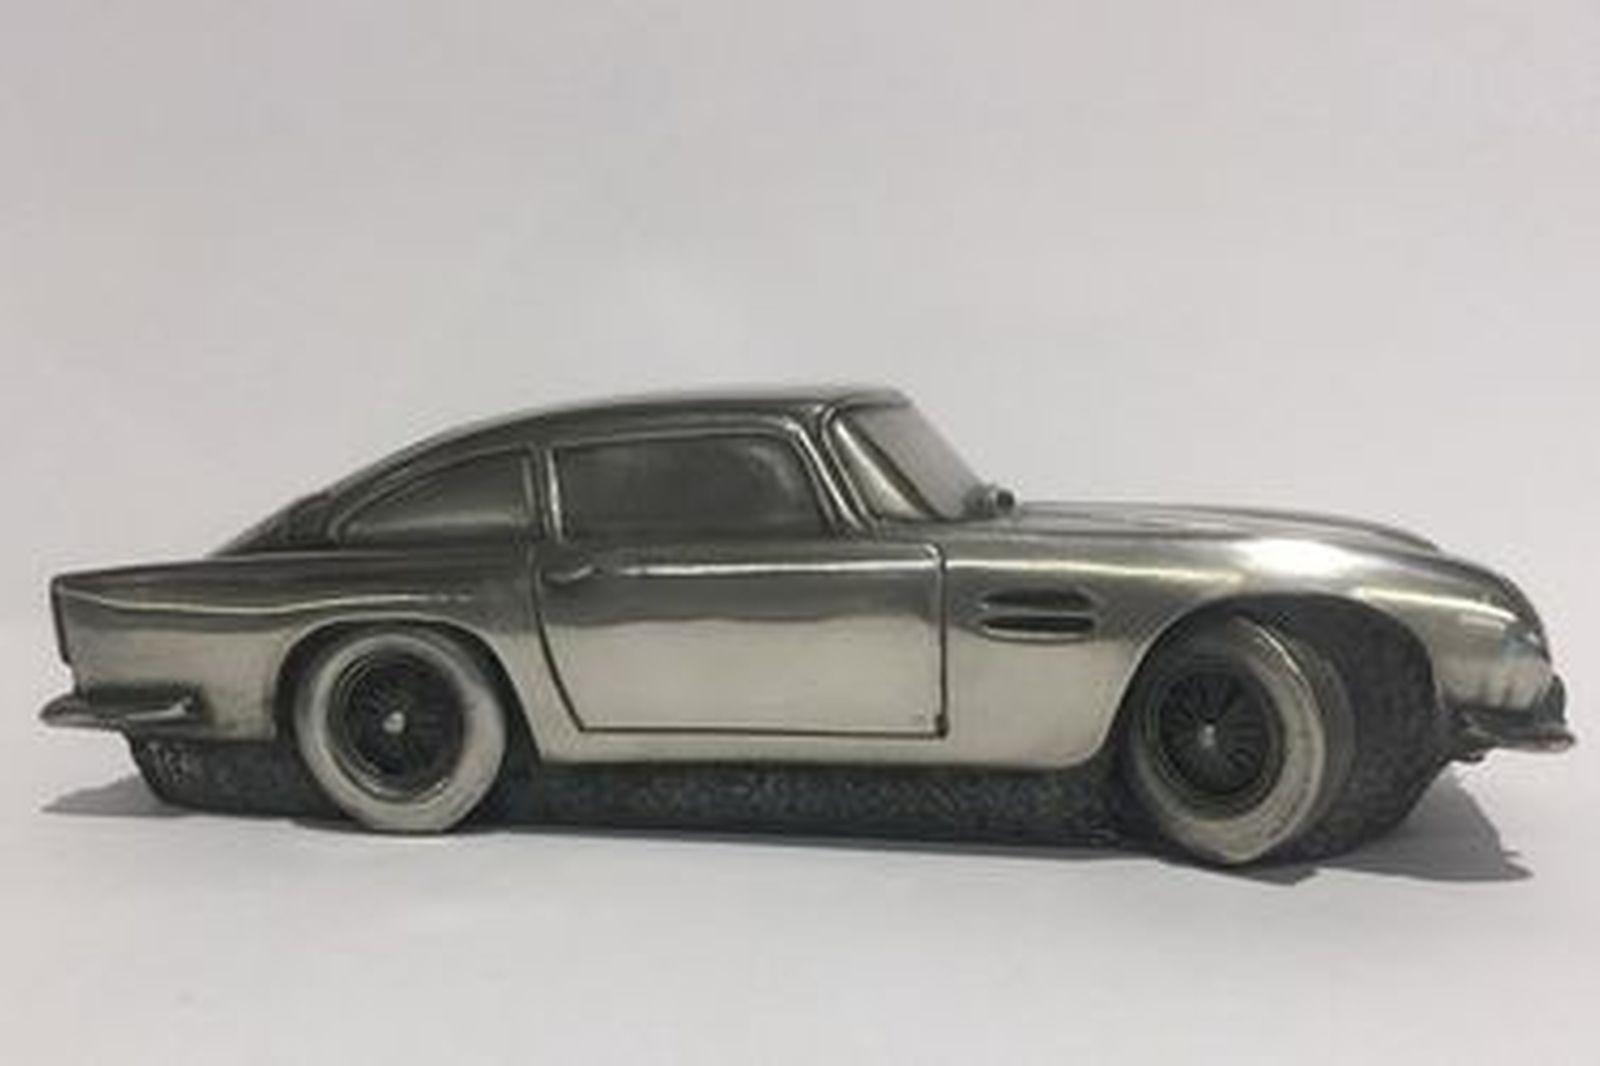 Pewter Model Car - Aston Martin